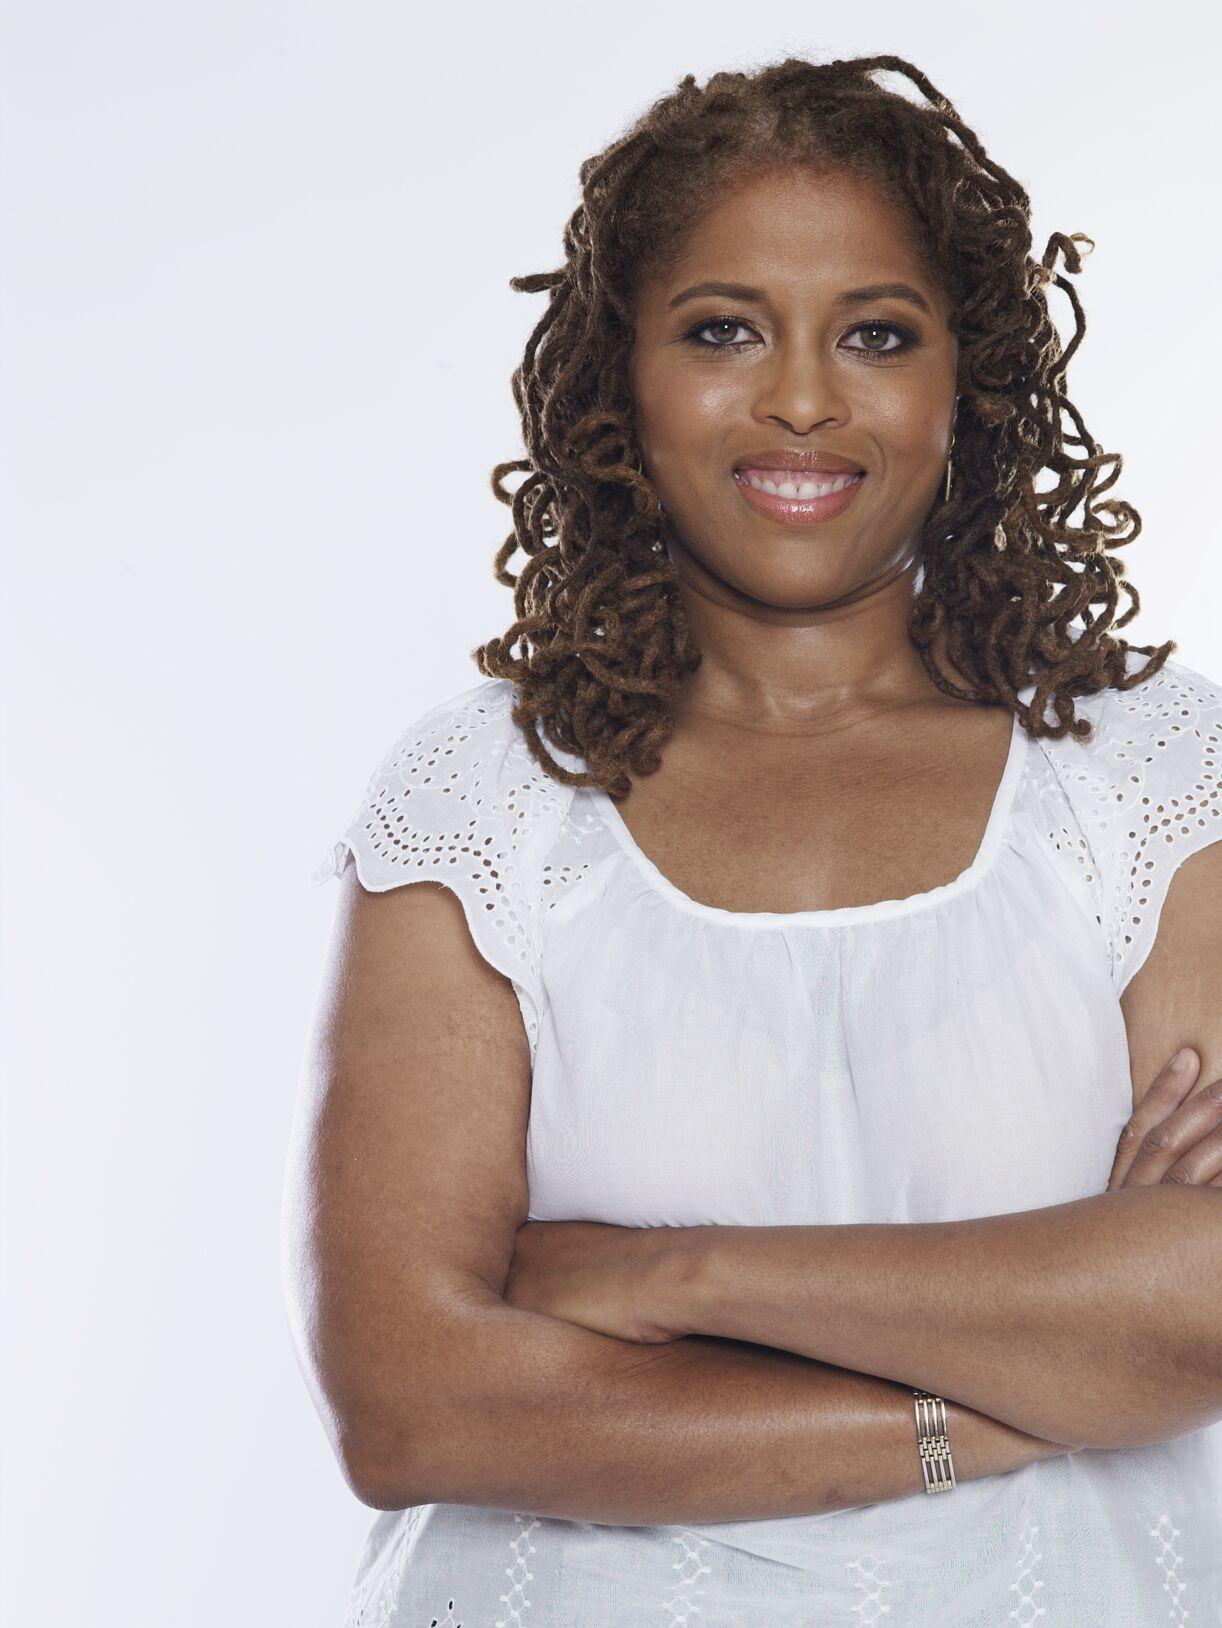 Groovy Naturally Professional Carolyn Edgar Afrobella Short Hairstyles For Black Women Fulllsitofus